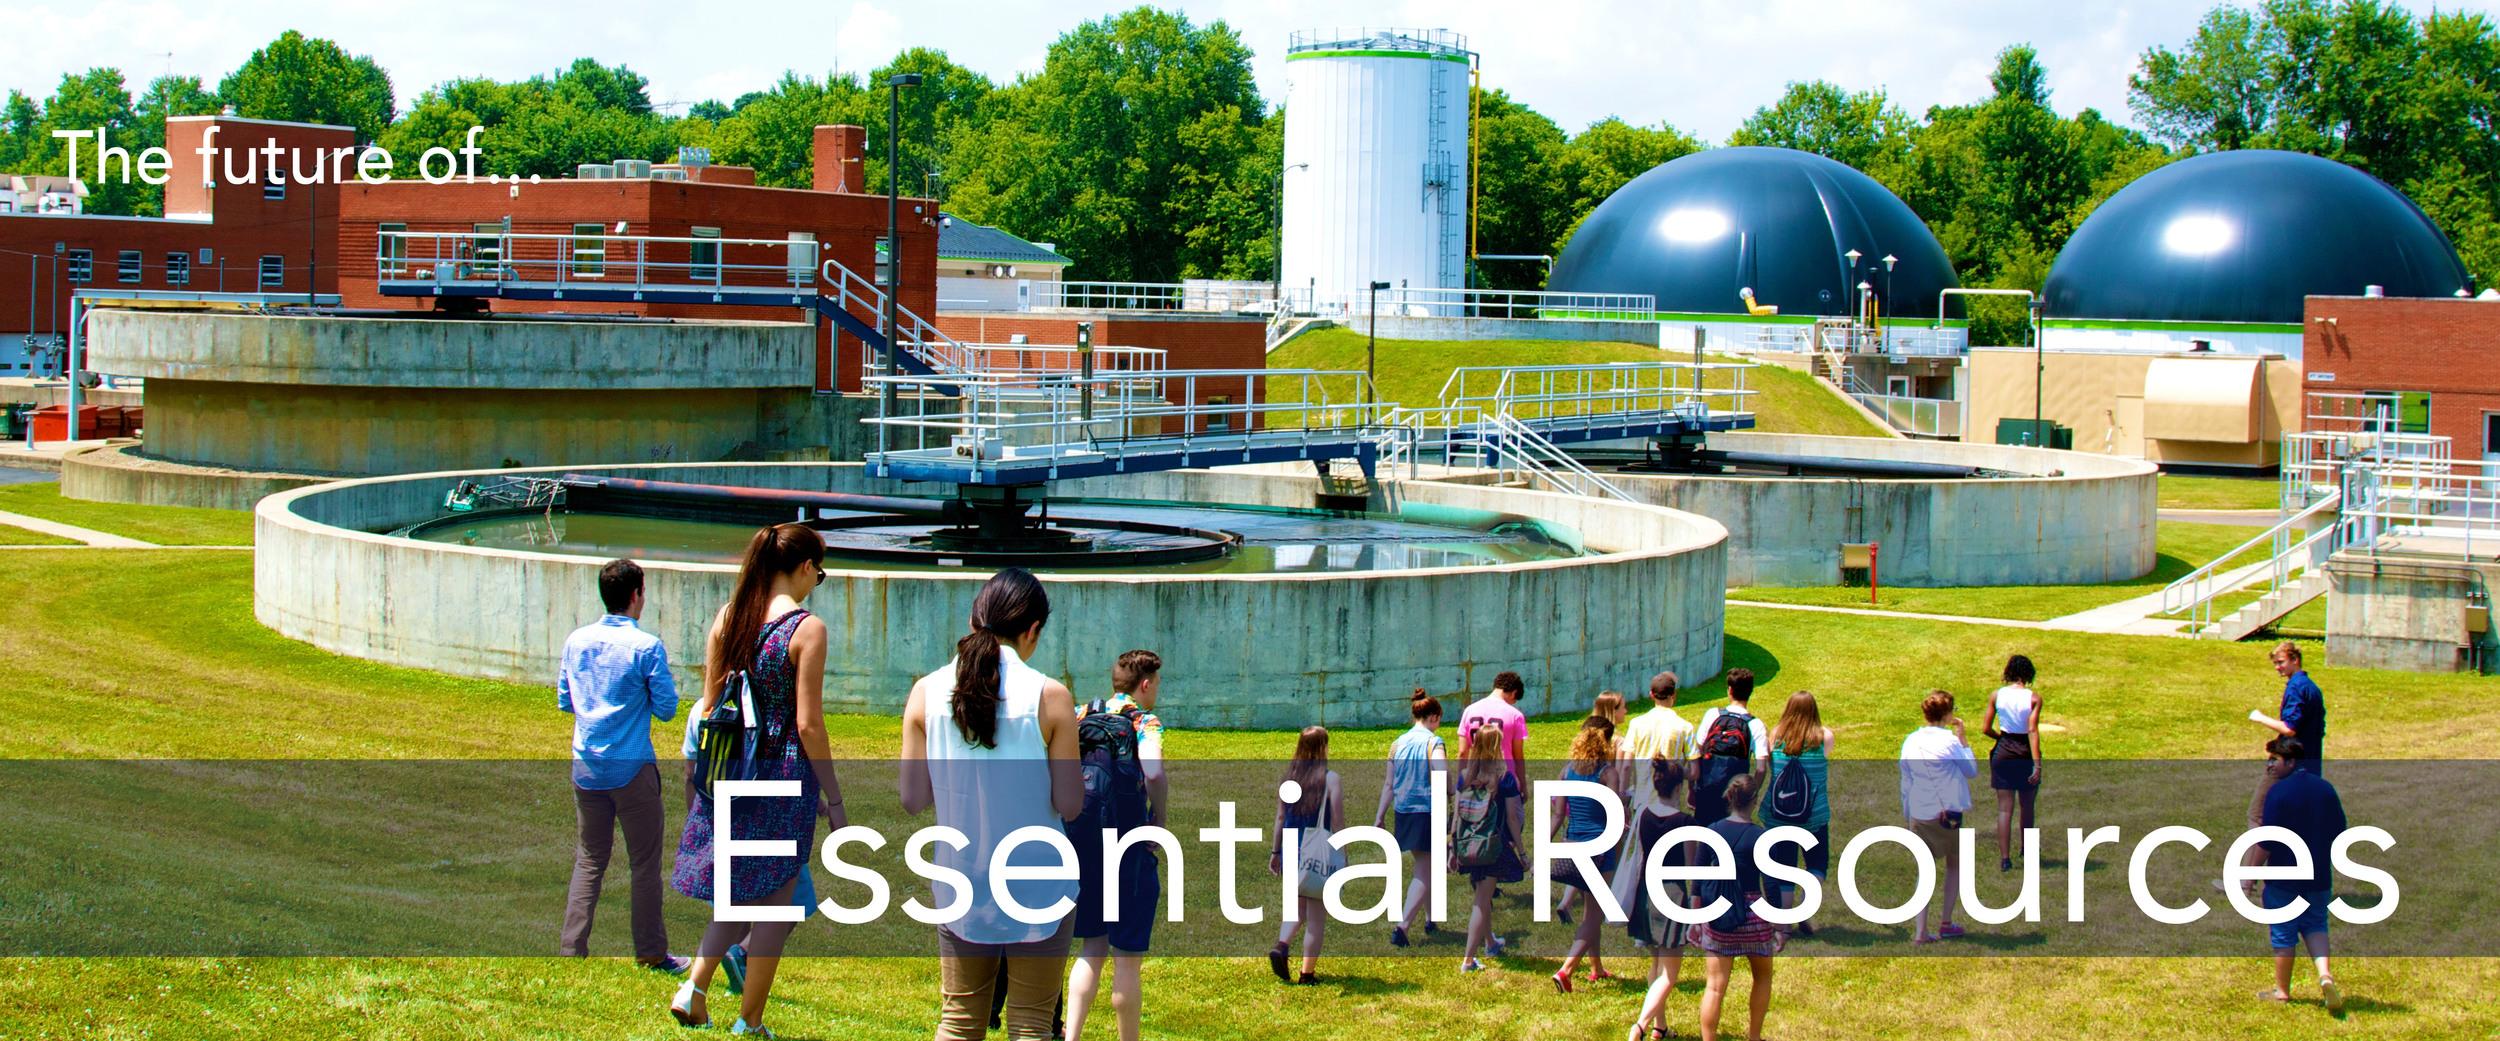 Future of Essential Resources .jpg